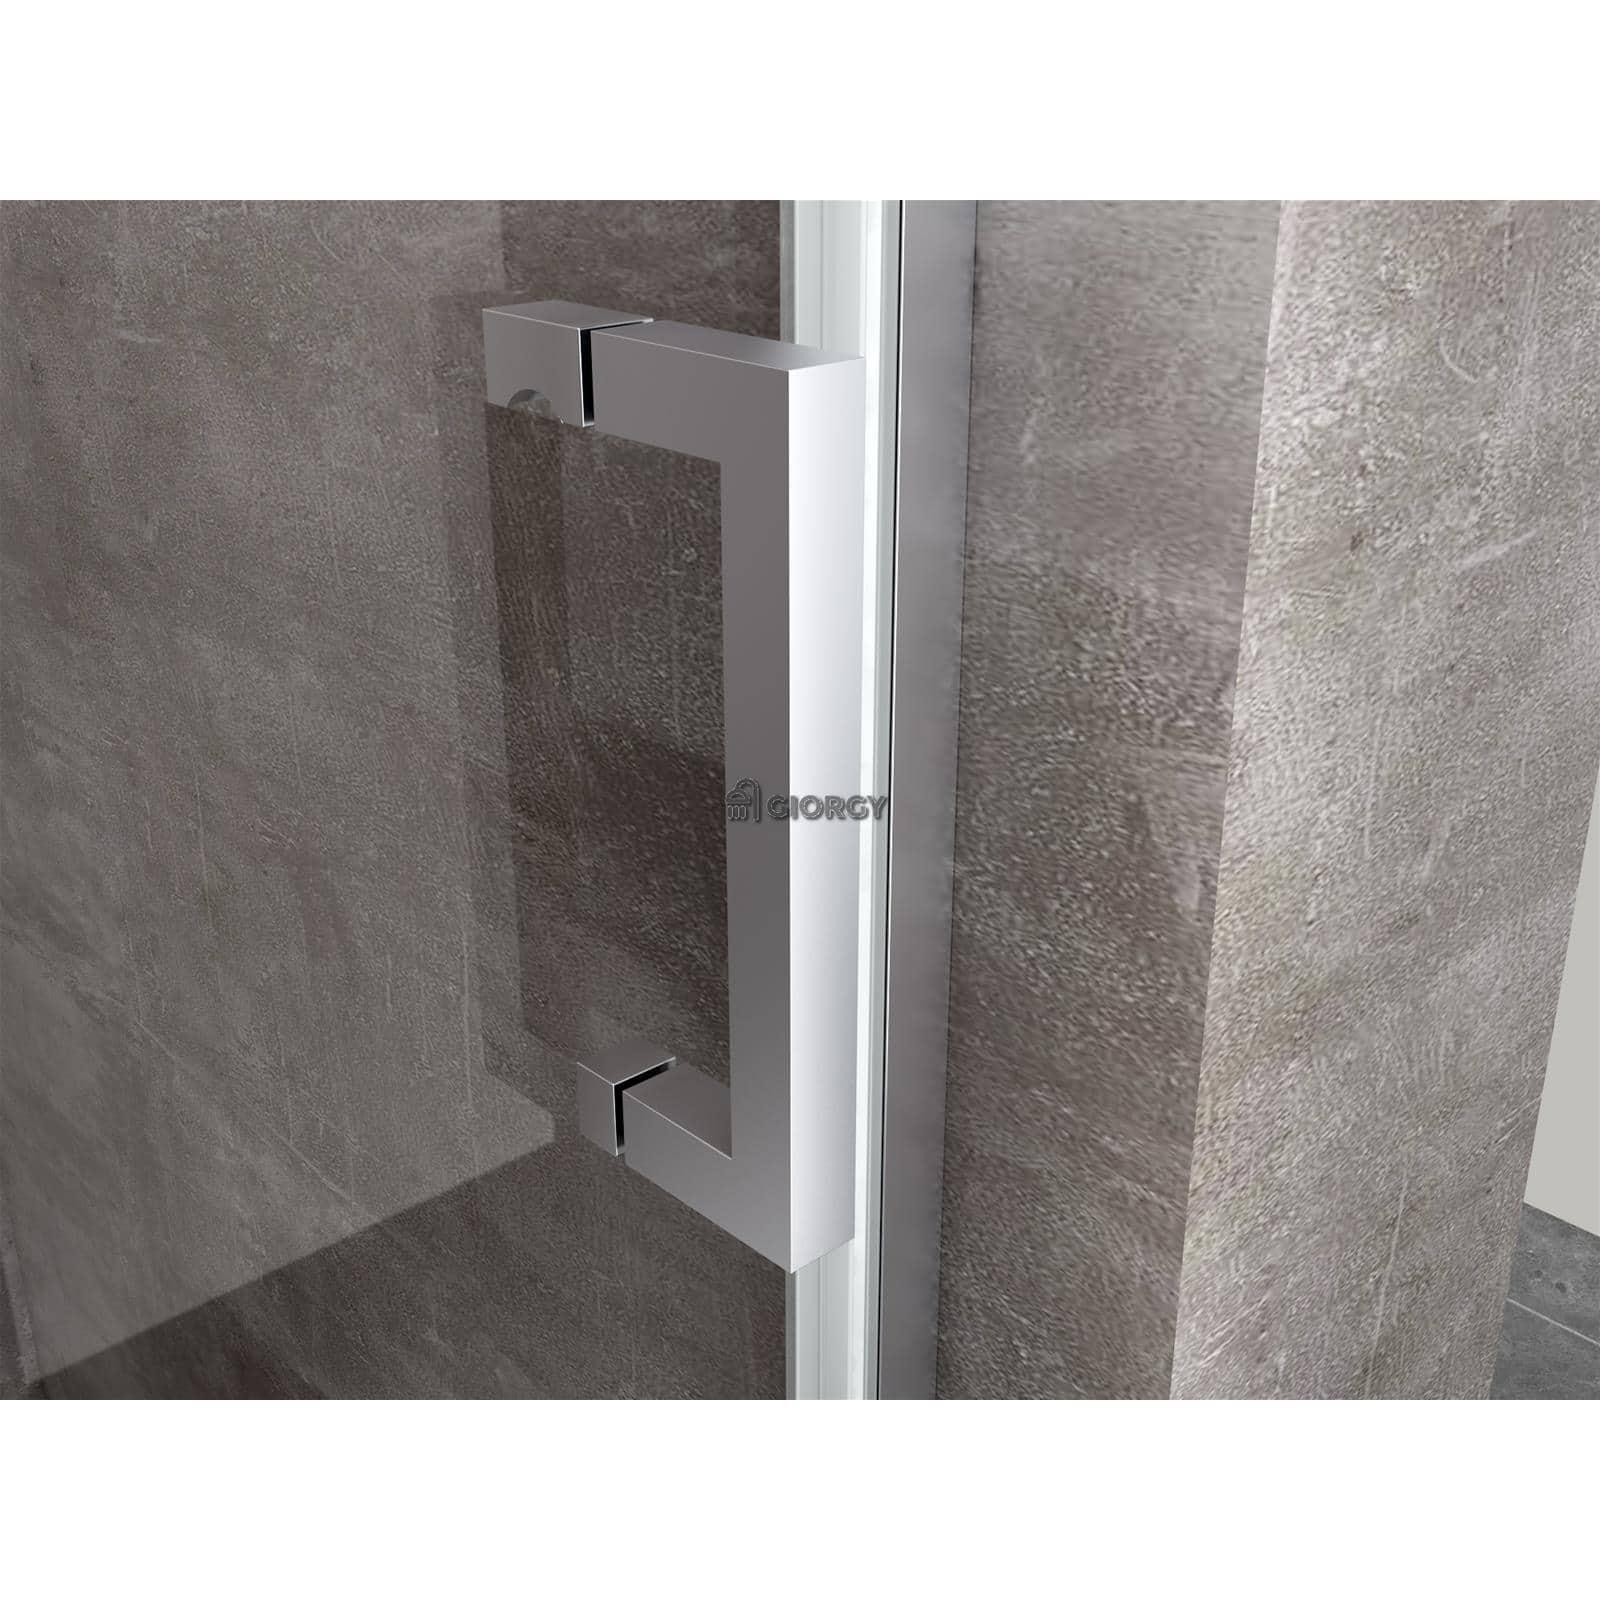 Porta doccia anta scorrevole nicchia vetro 8 mm 100 110 120 140 150 160 170 180 ebay - Porta scorrevole per doccia ...